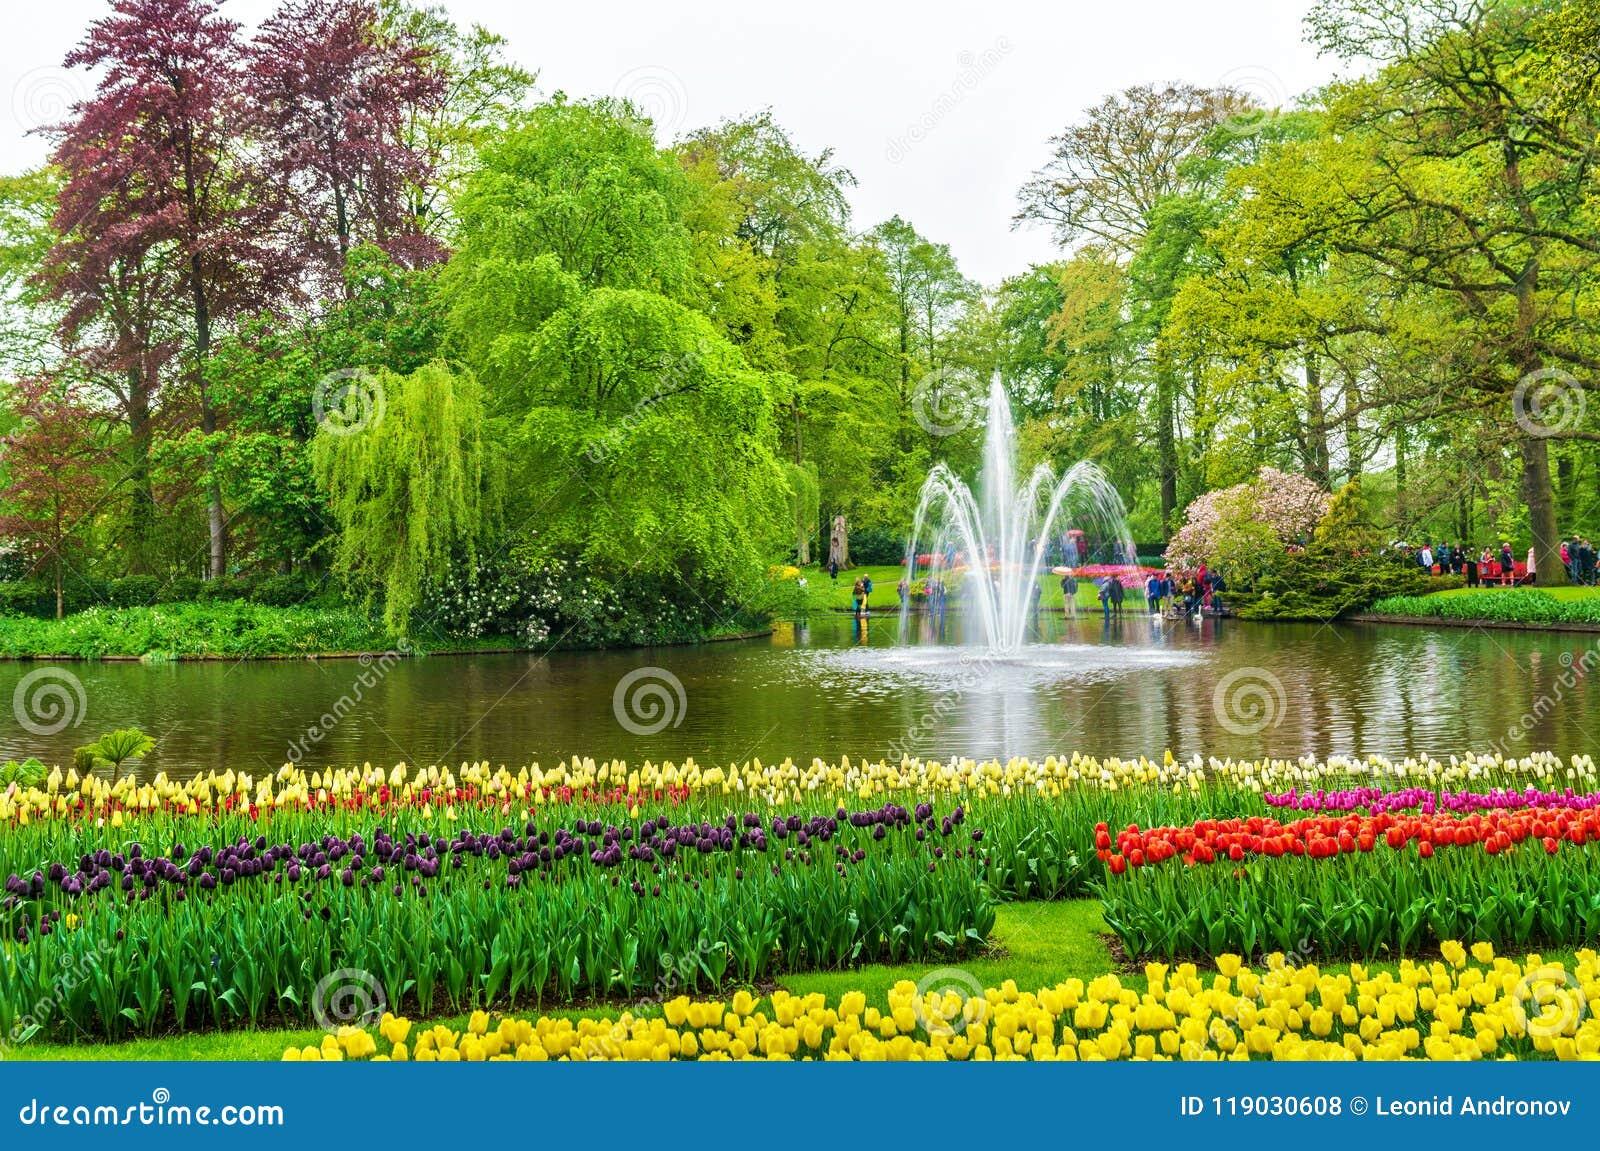 View Of Keukenhof Garden Also Known As The Garden Of Europe In